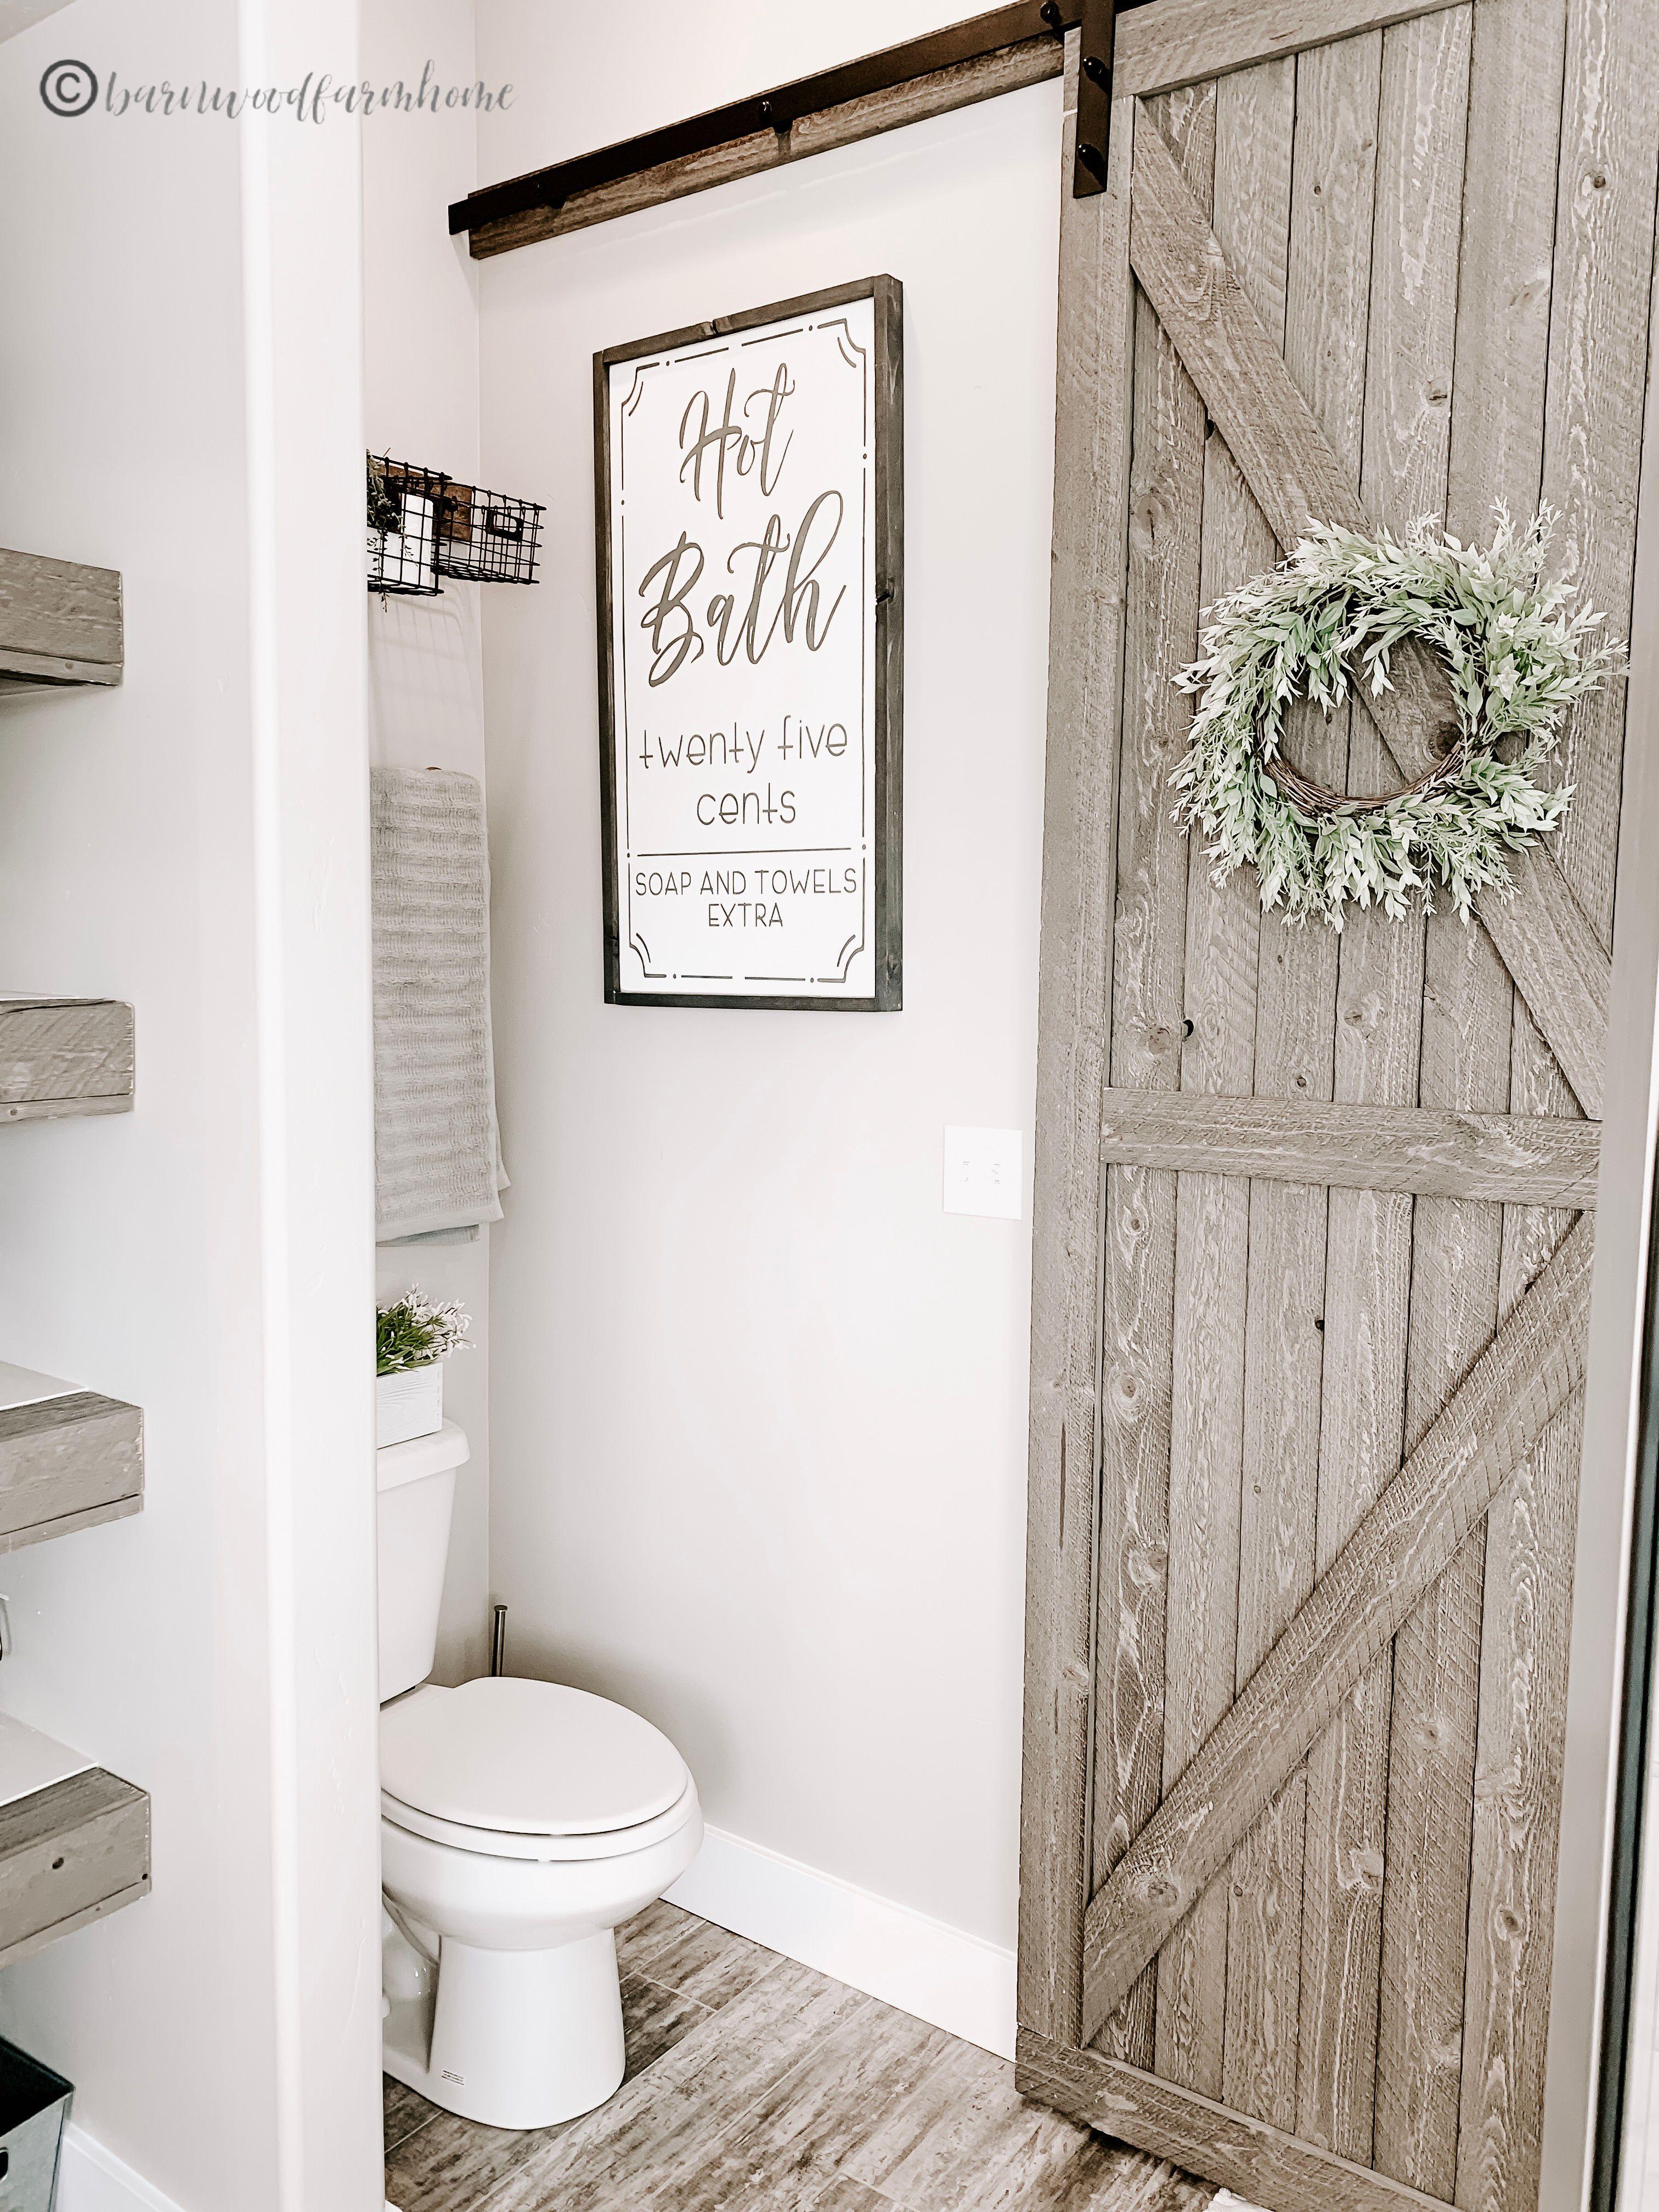 Farmhouse bathroom style with DIY barn door and barnwood